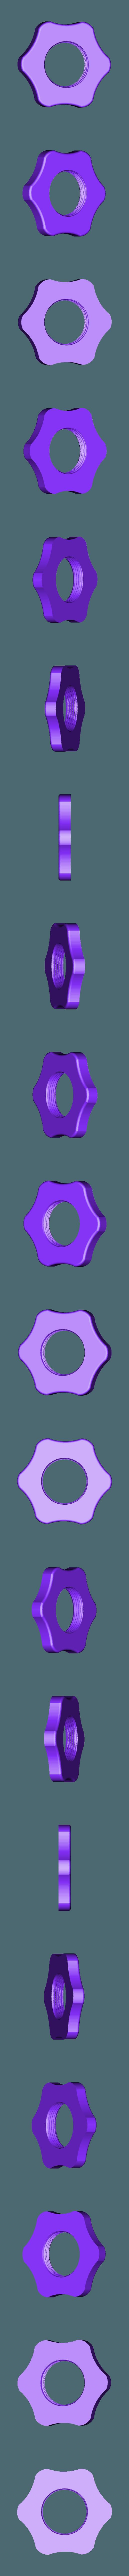 ecrou_bobine.stl Download free STL file Ecrou M 30  x 1,5 spool holder : Cr-10 et Cr-10s • 3D print object, Cyborg